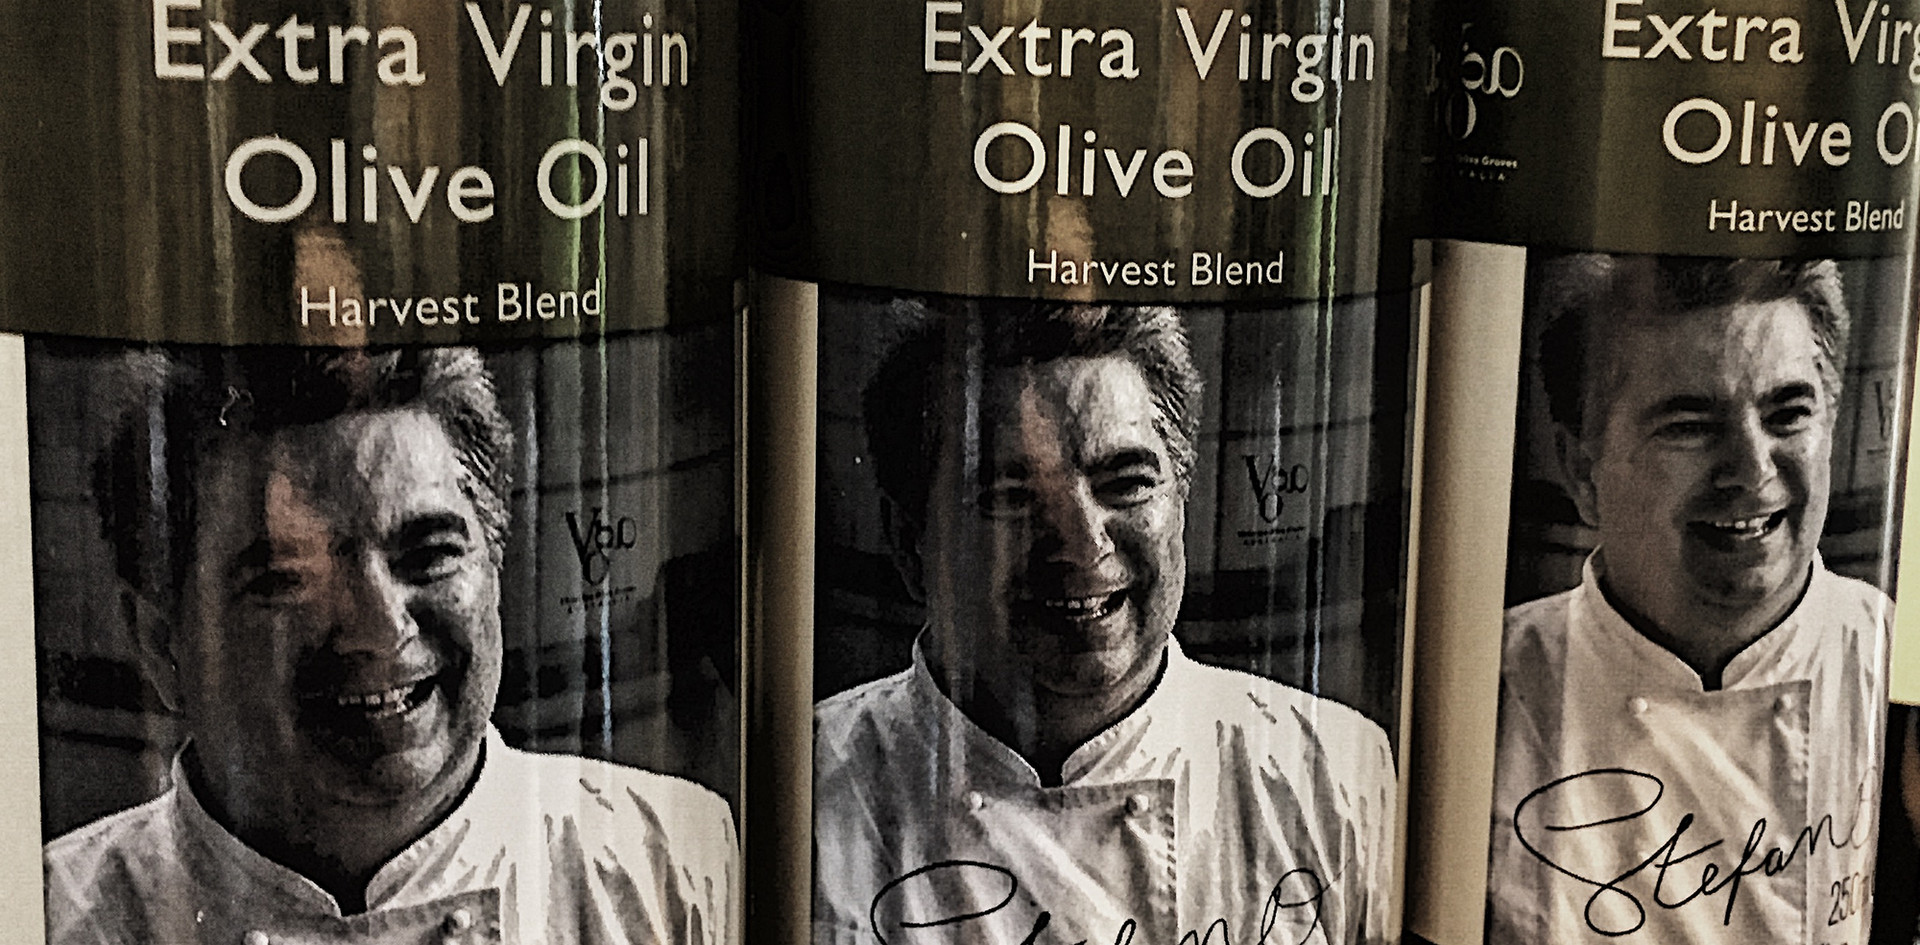 Stephano's olive oil